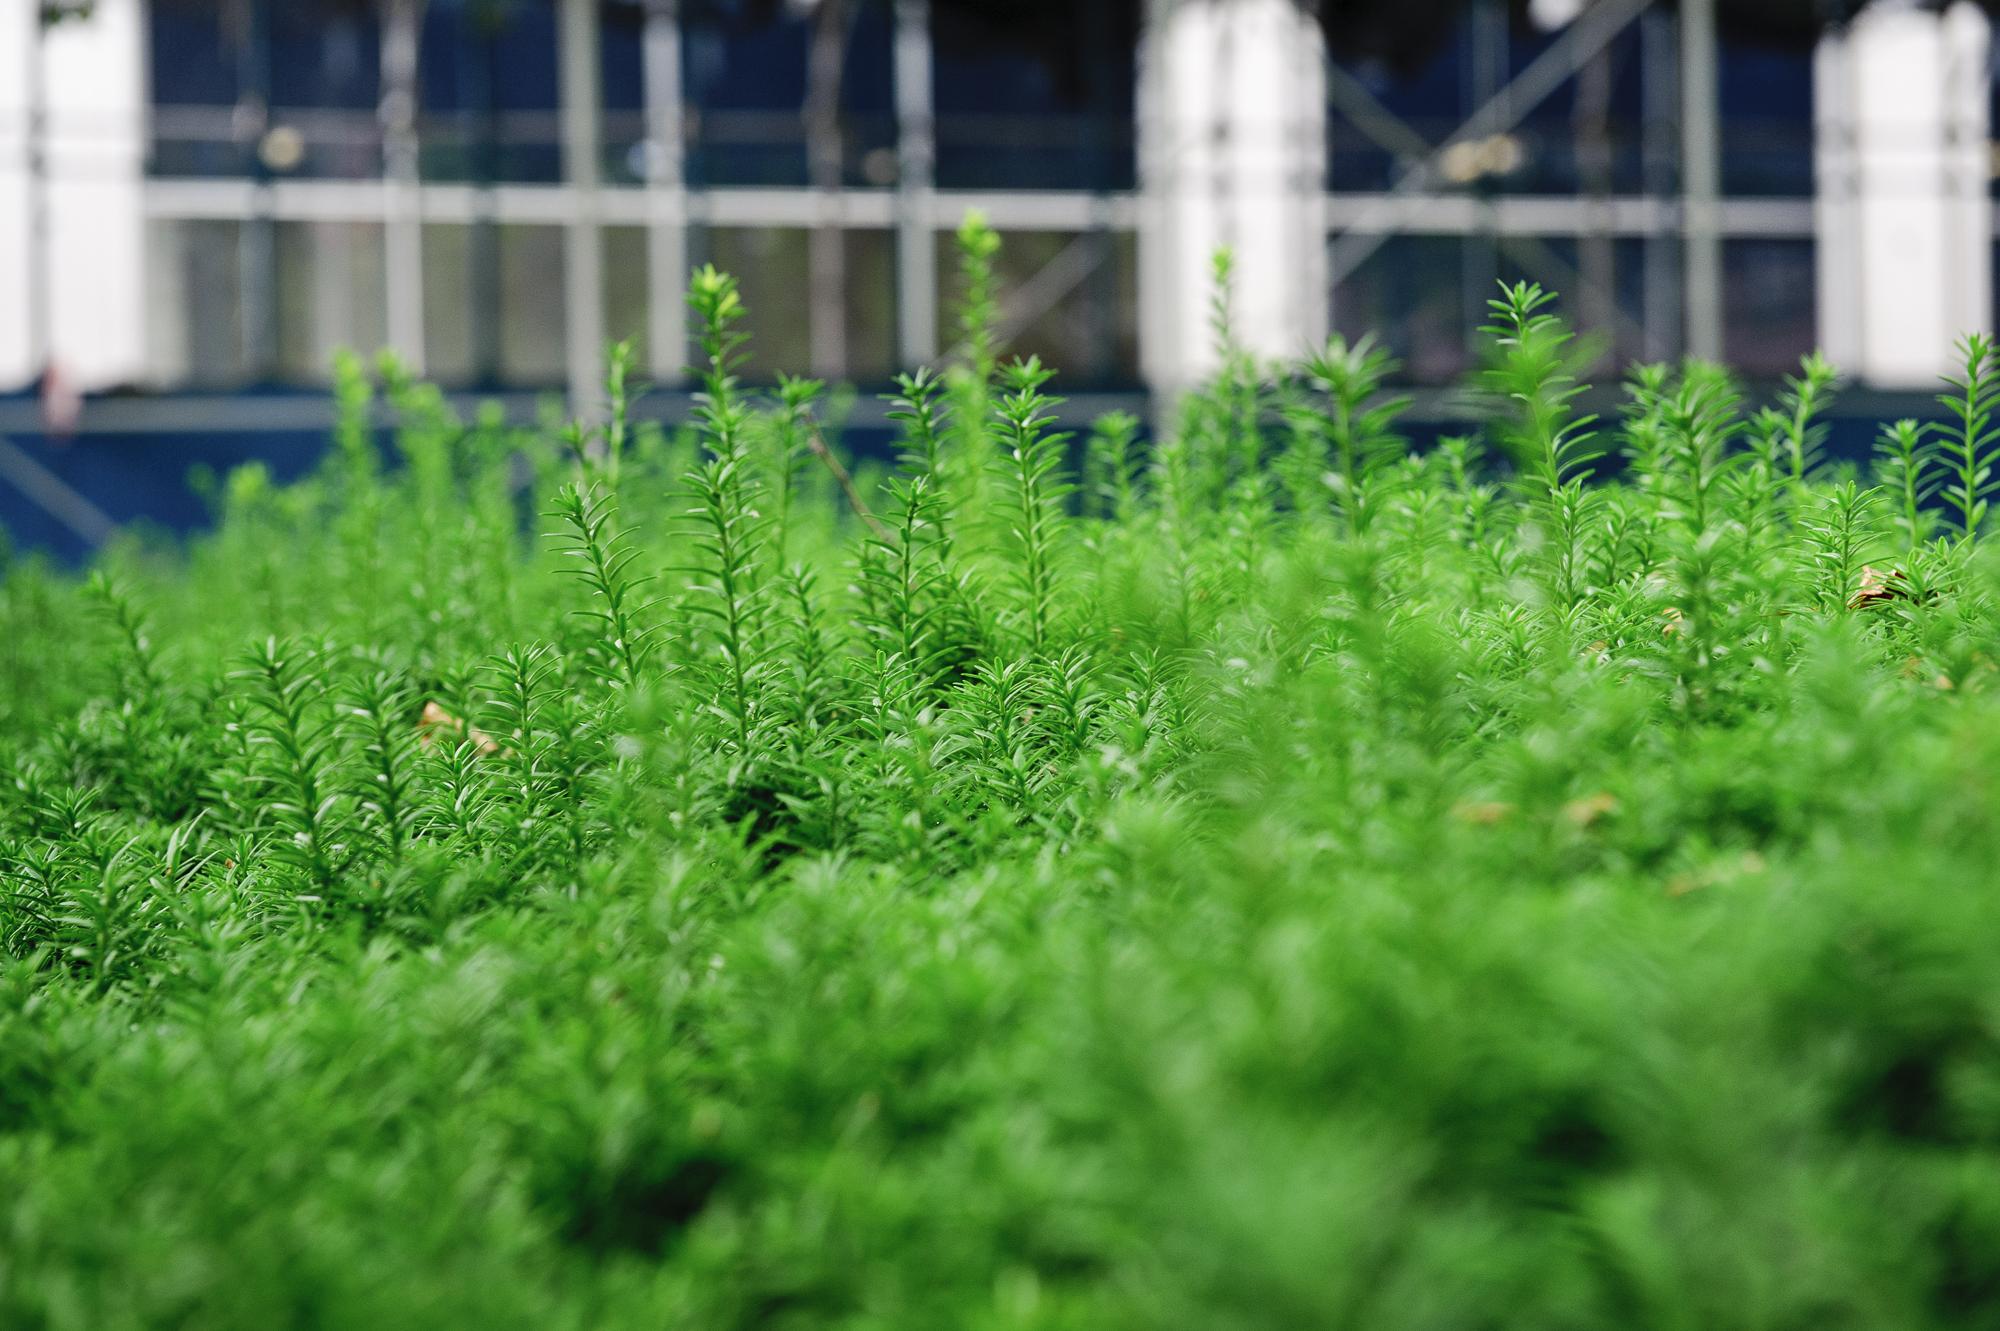 06.07.10-rooftop_BBQ_01.jpg